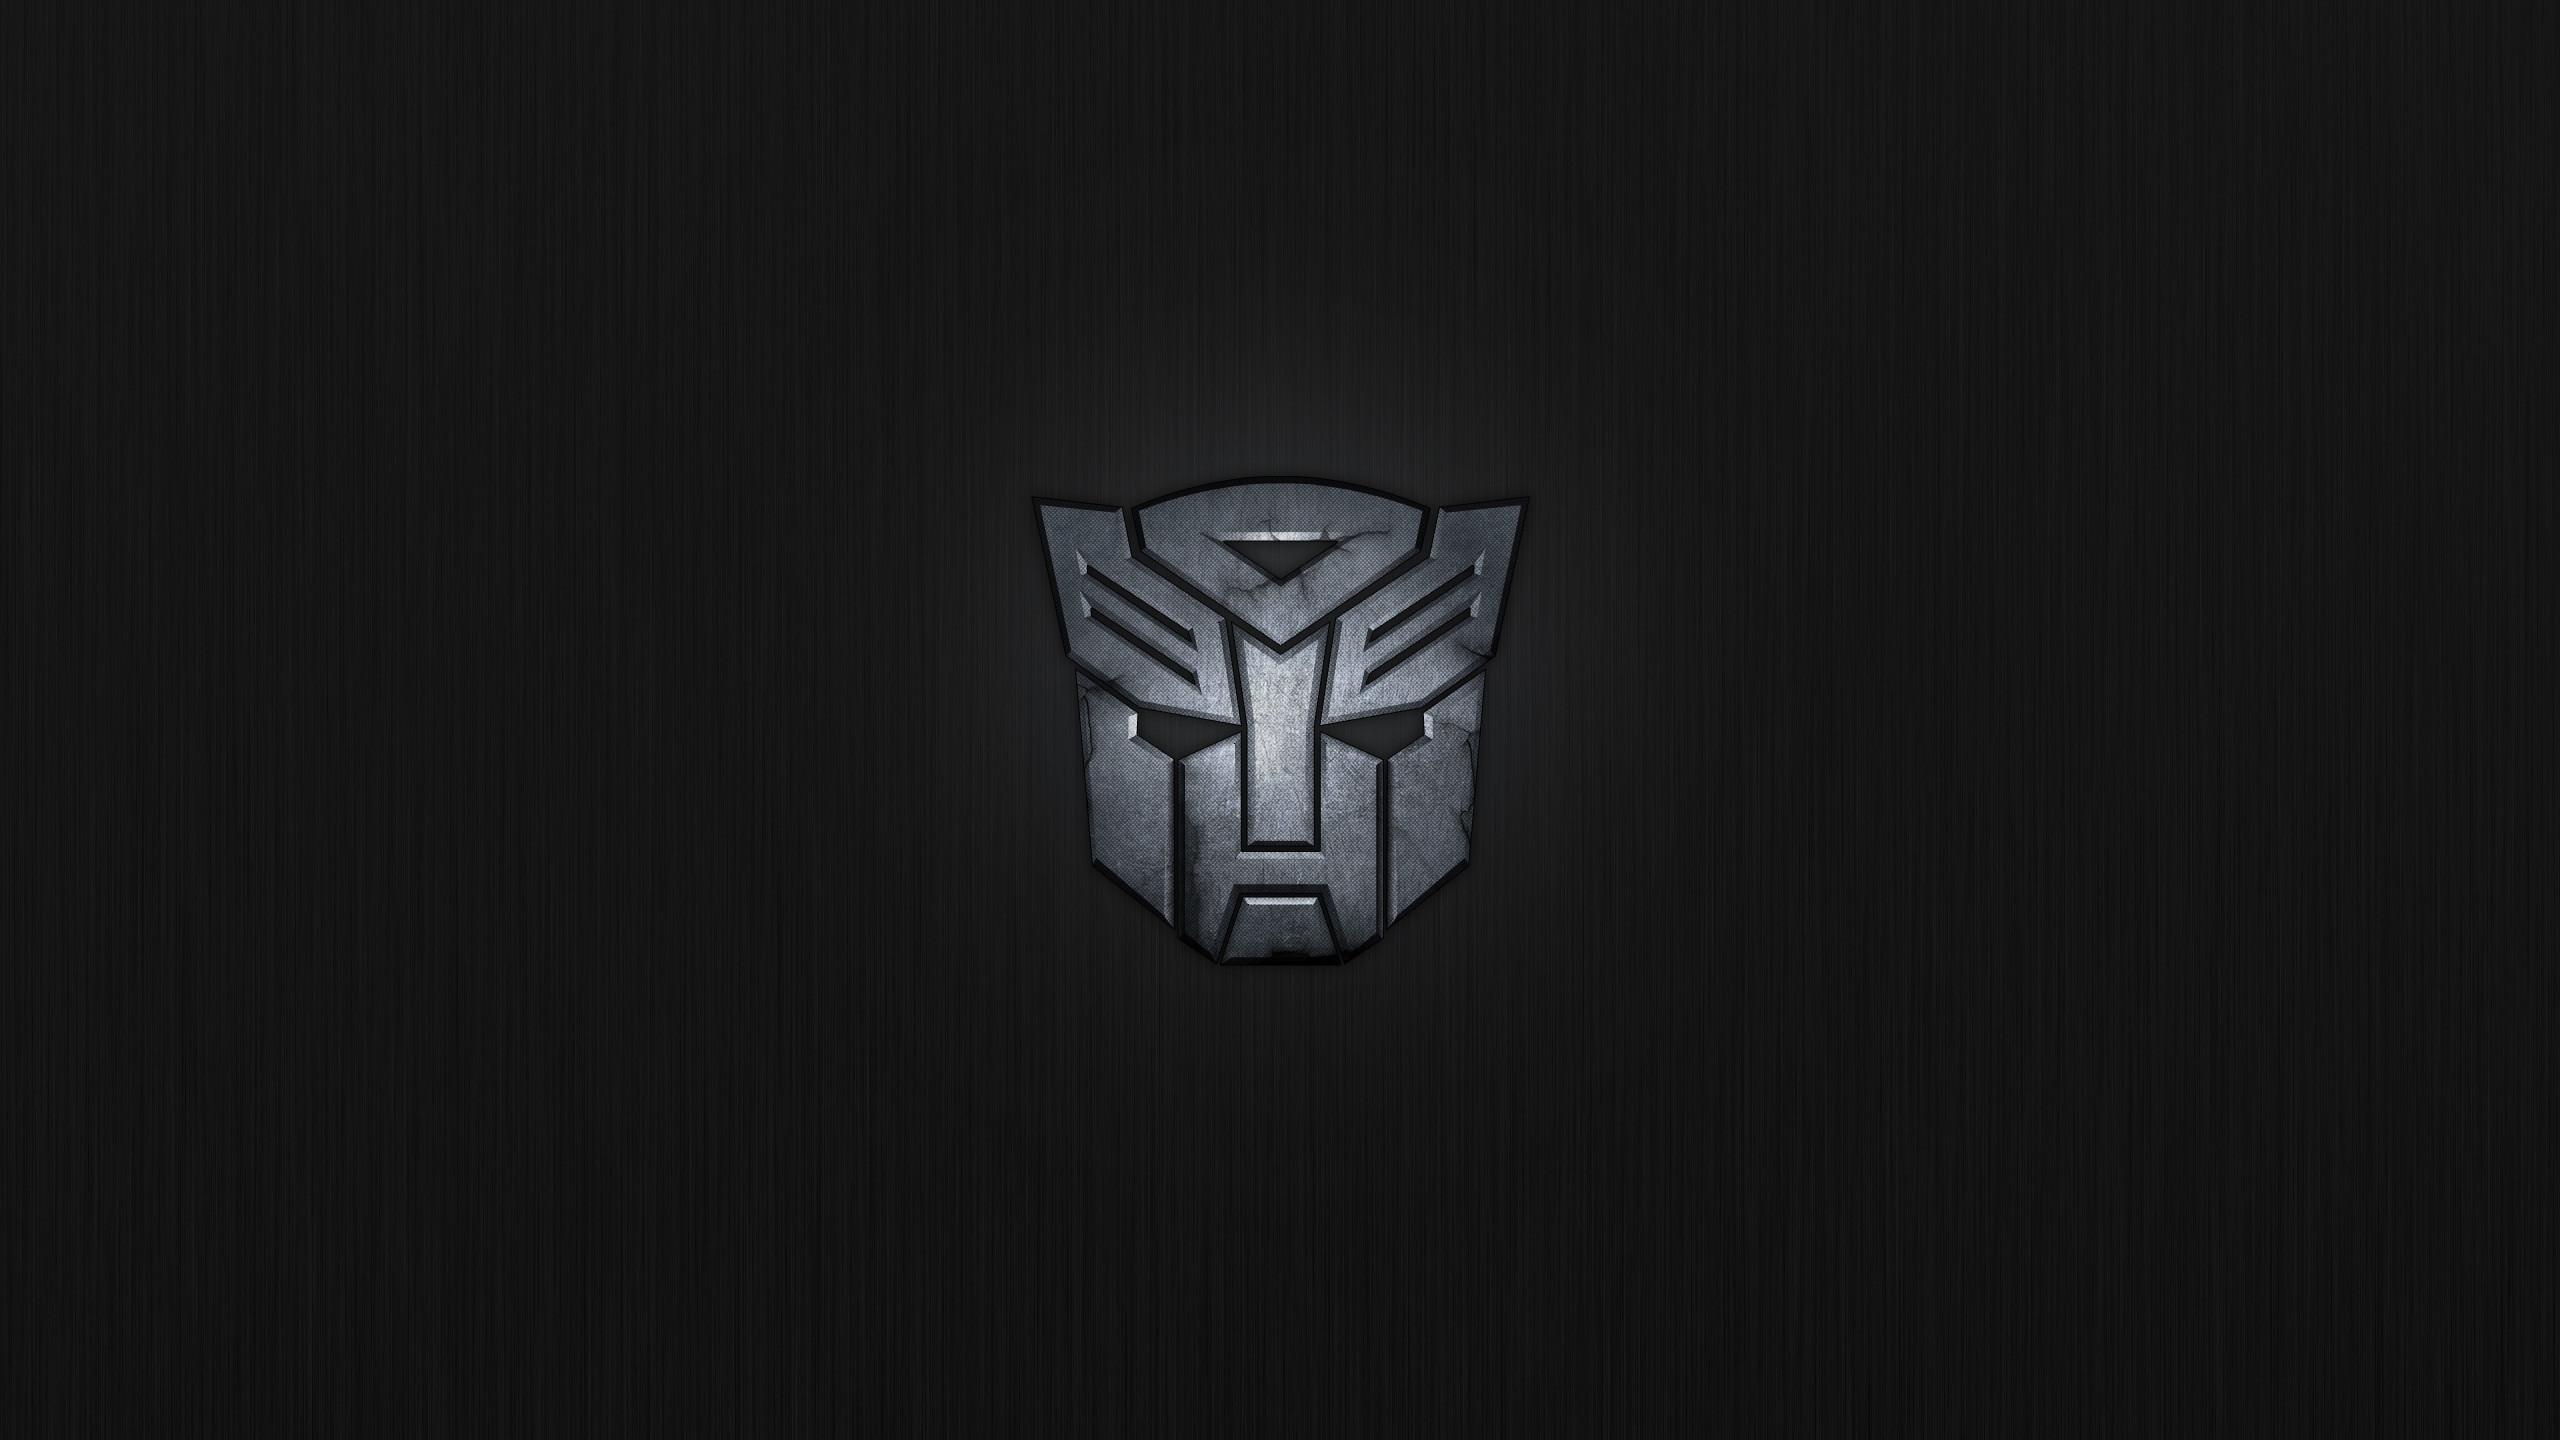 G1 transformers wallpaper hd 66 images for Fondo de pantalla joker hd